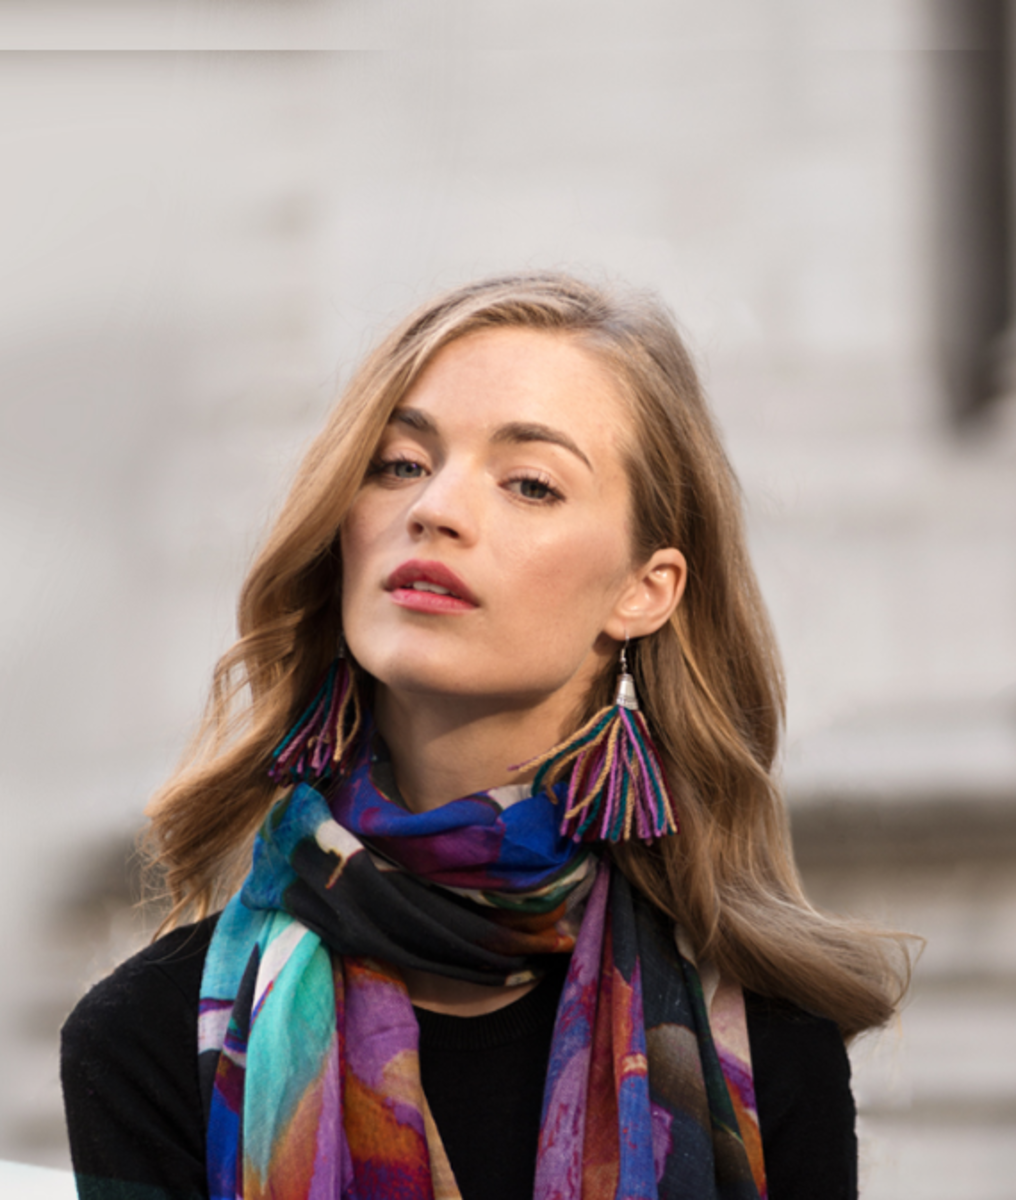 Fashion Beauty Internships: Bindya NY Is Hiring A Sales Representative In New York, NY